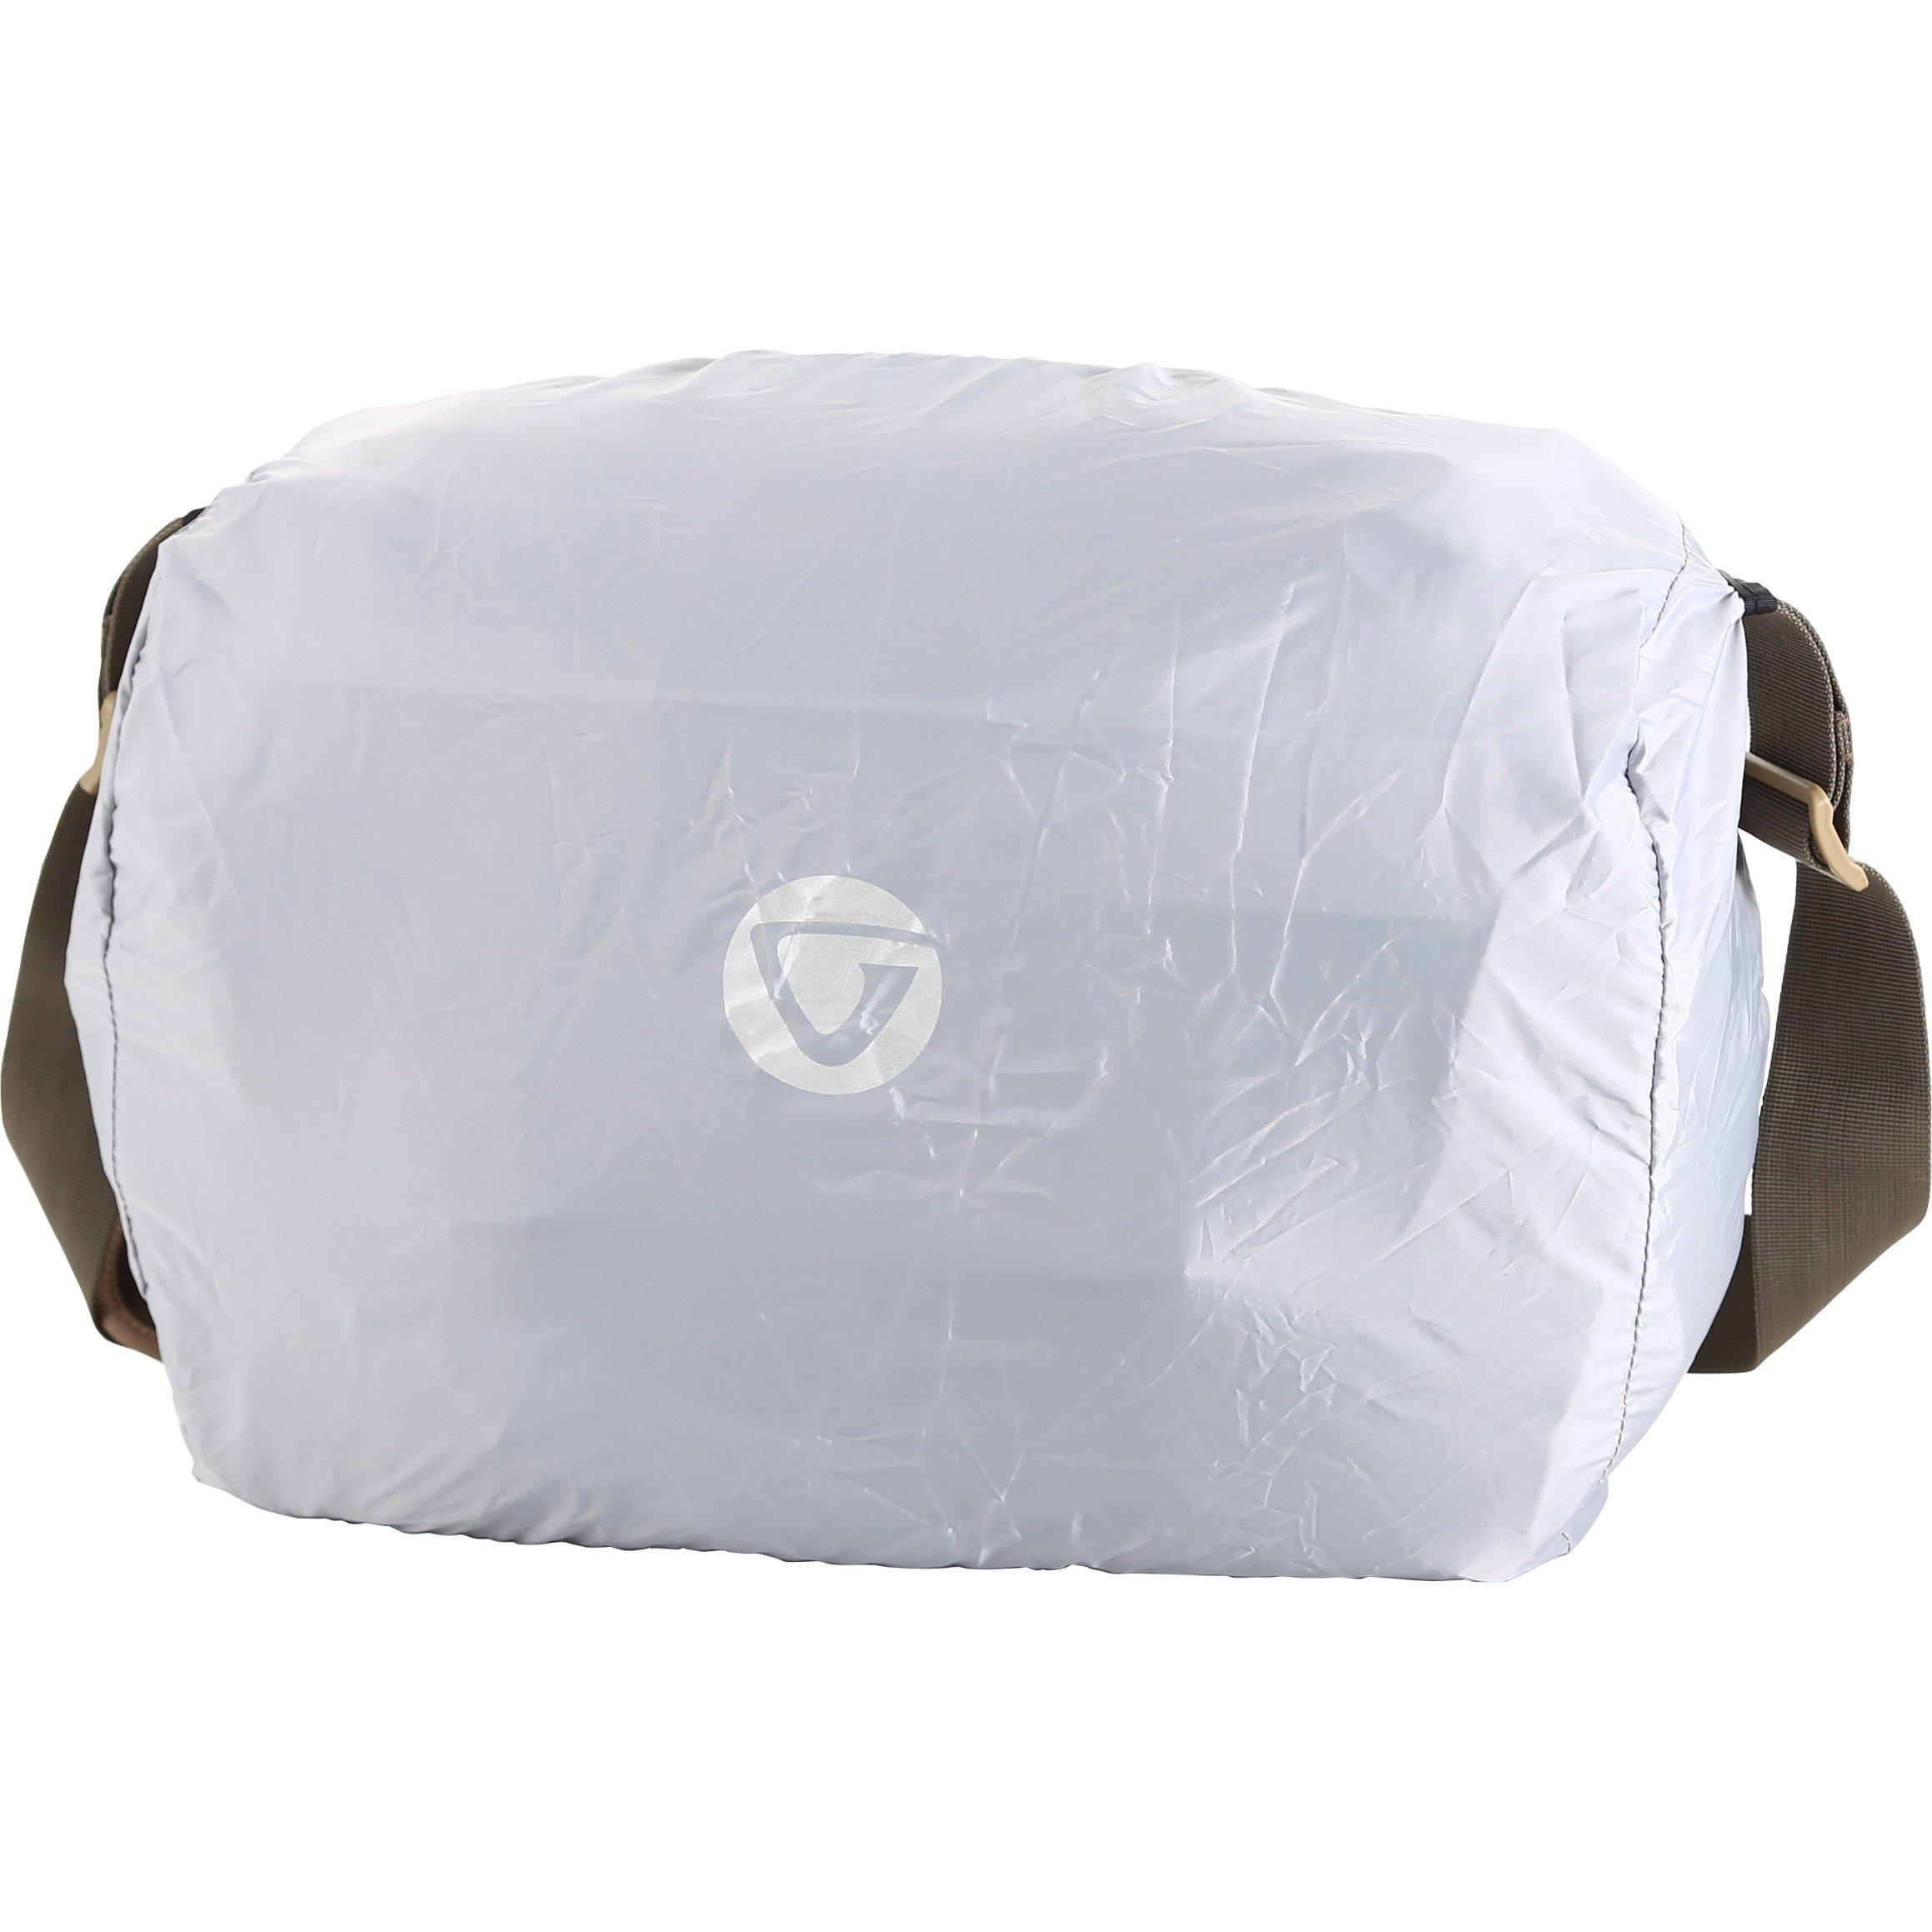 Vanguard Havana 38 - torba foto typu messenger bag